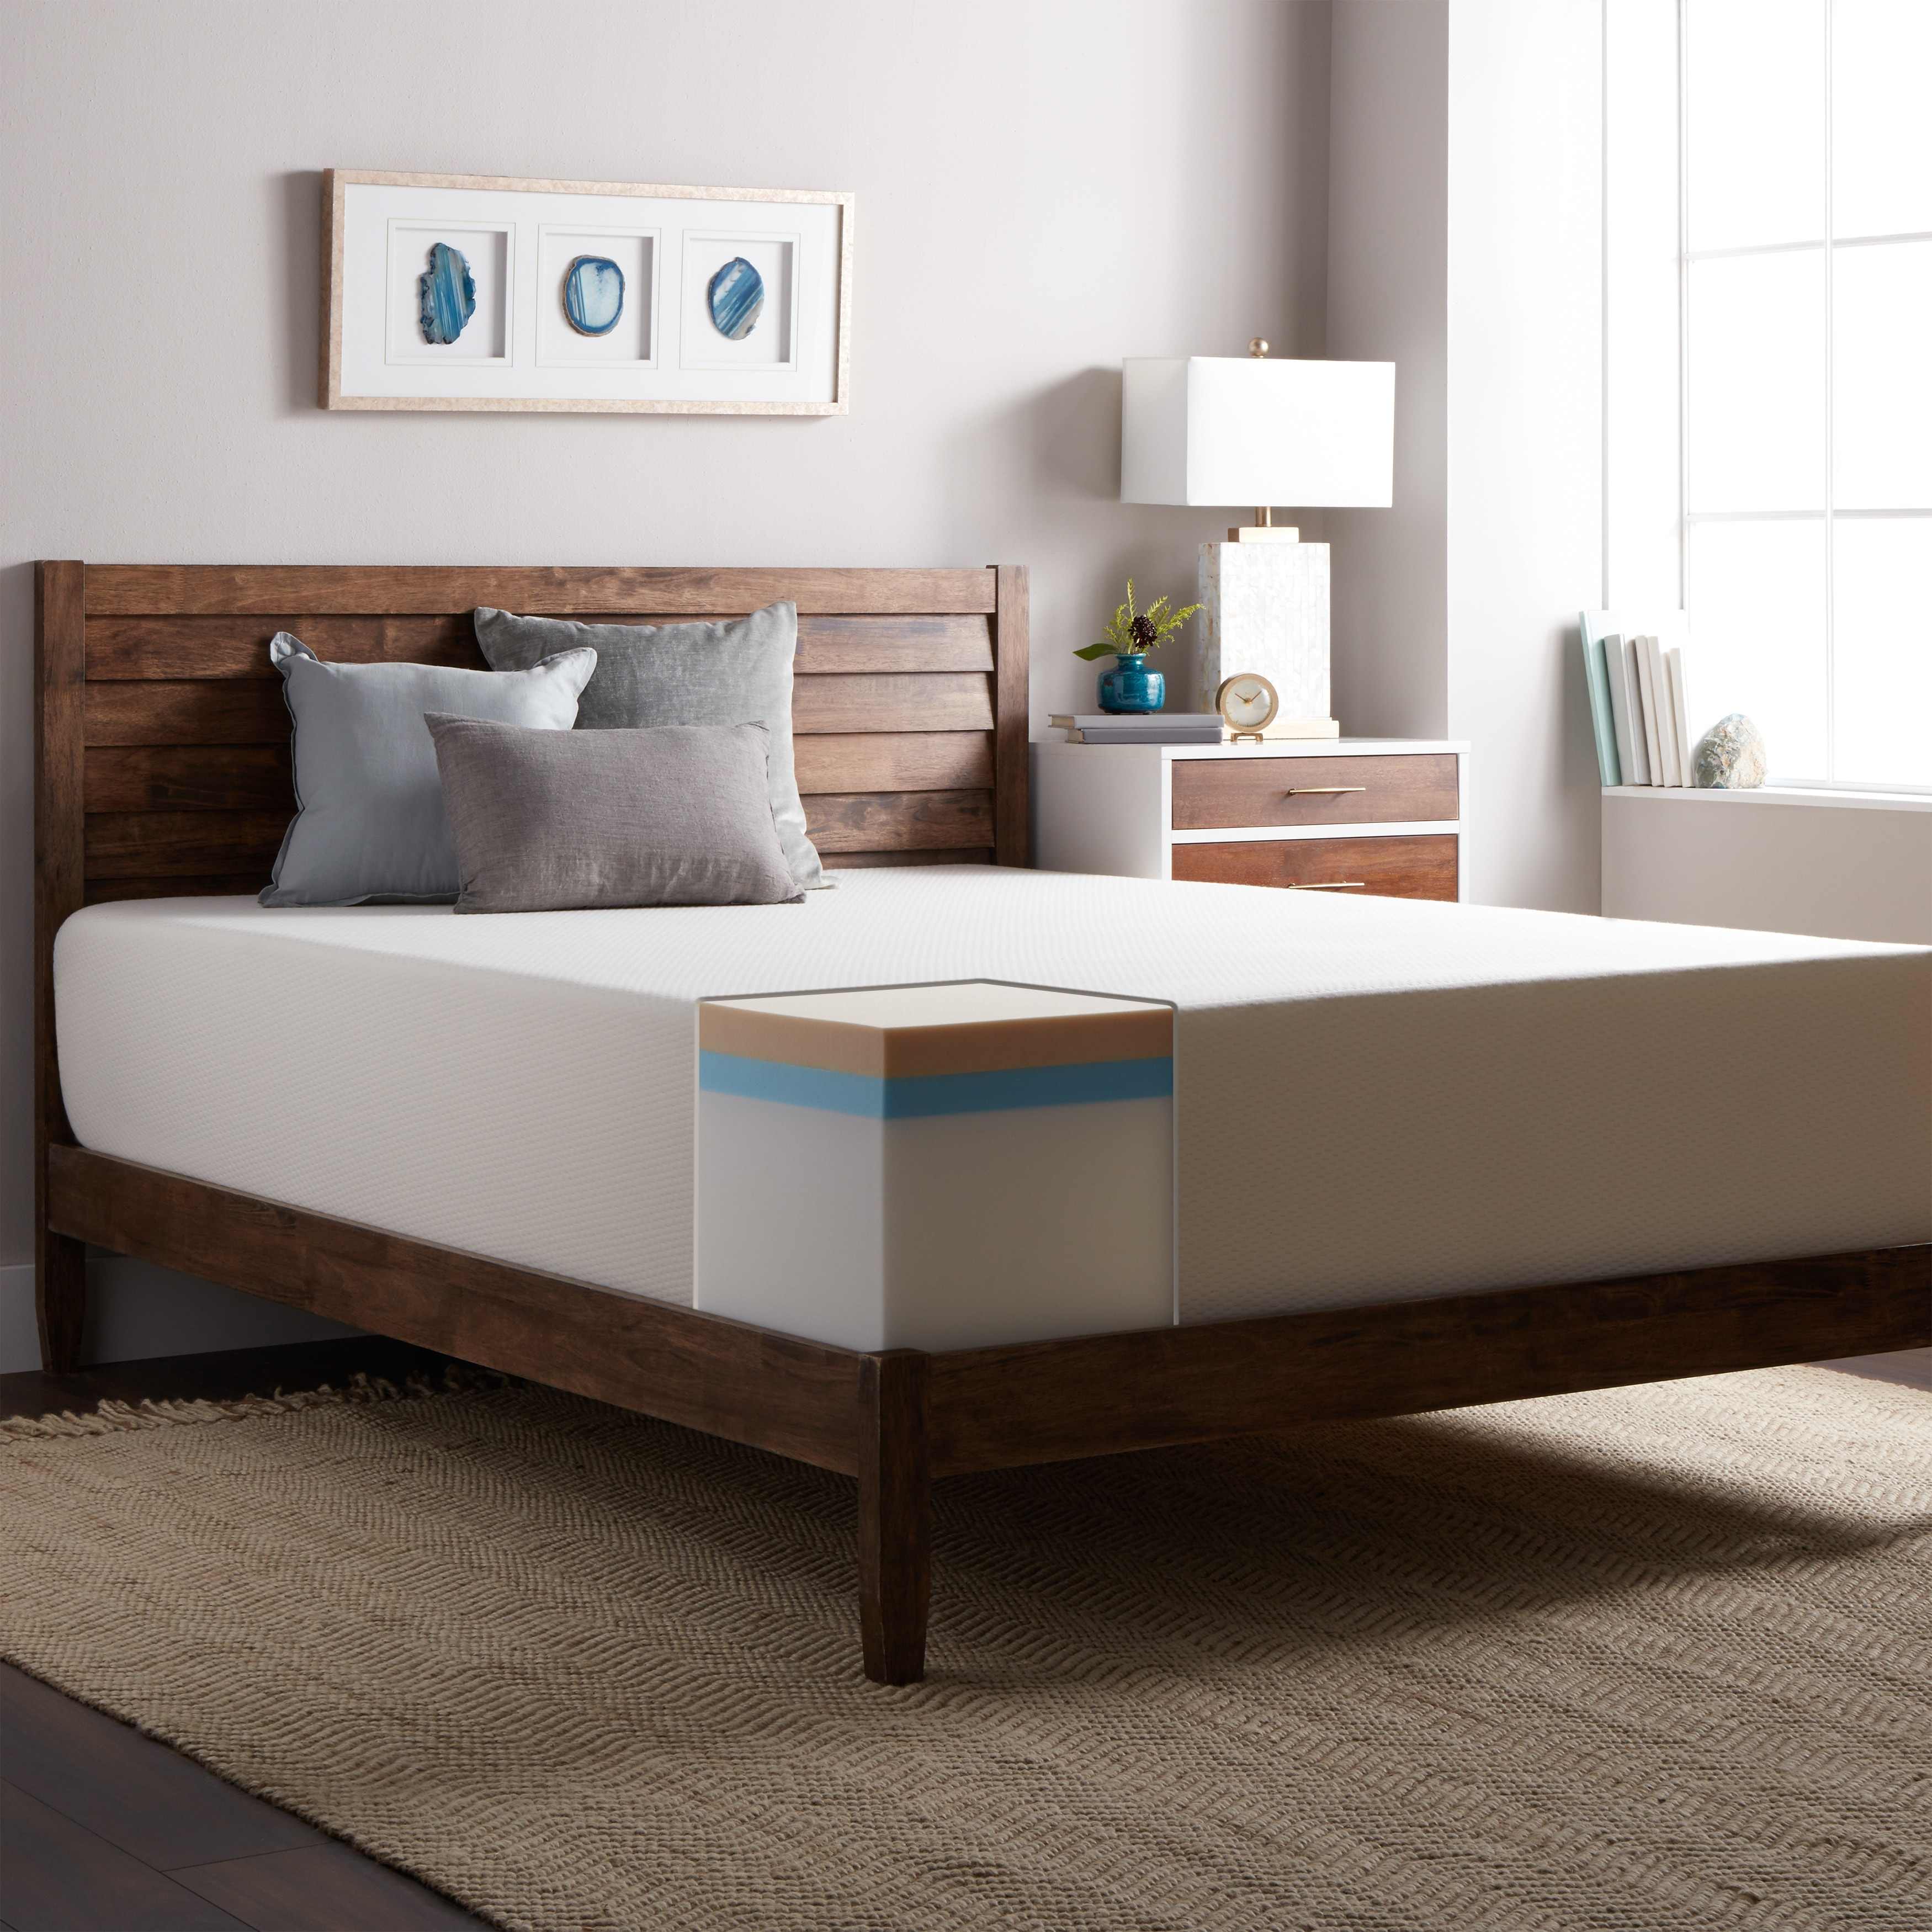 rochelle king super style mattress la size deal french antique bundle zoom bed mattresses